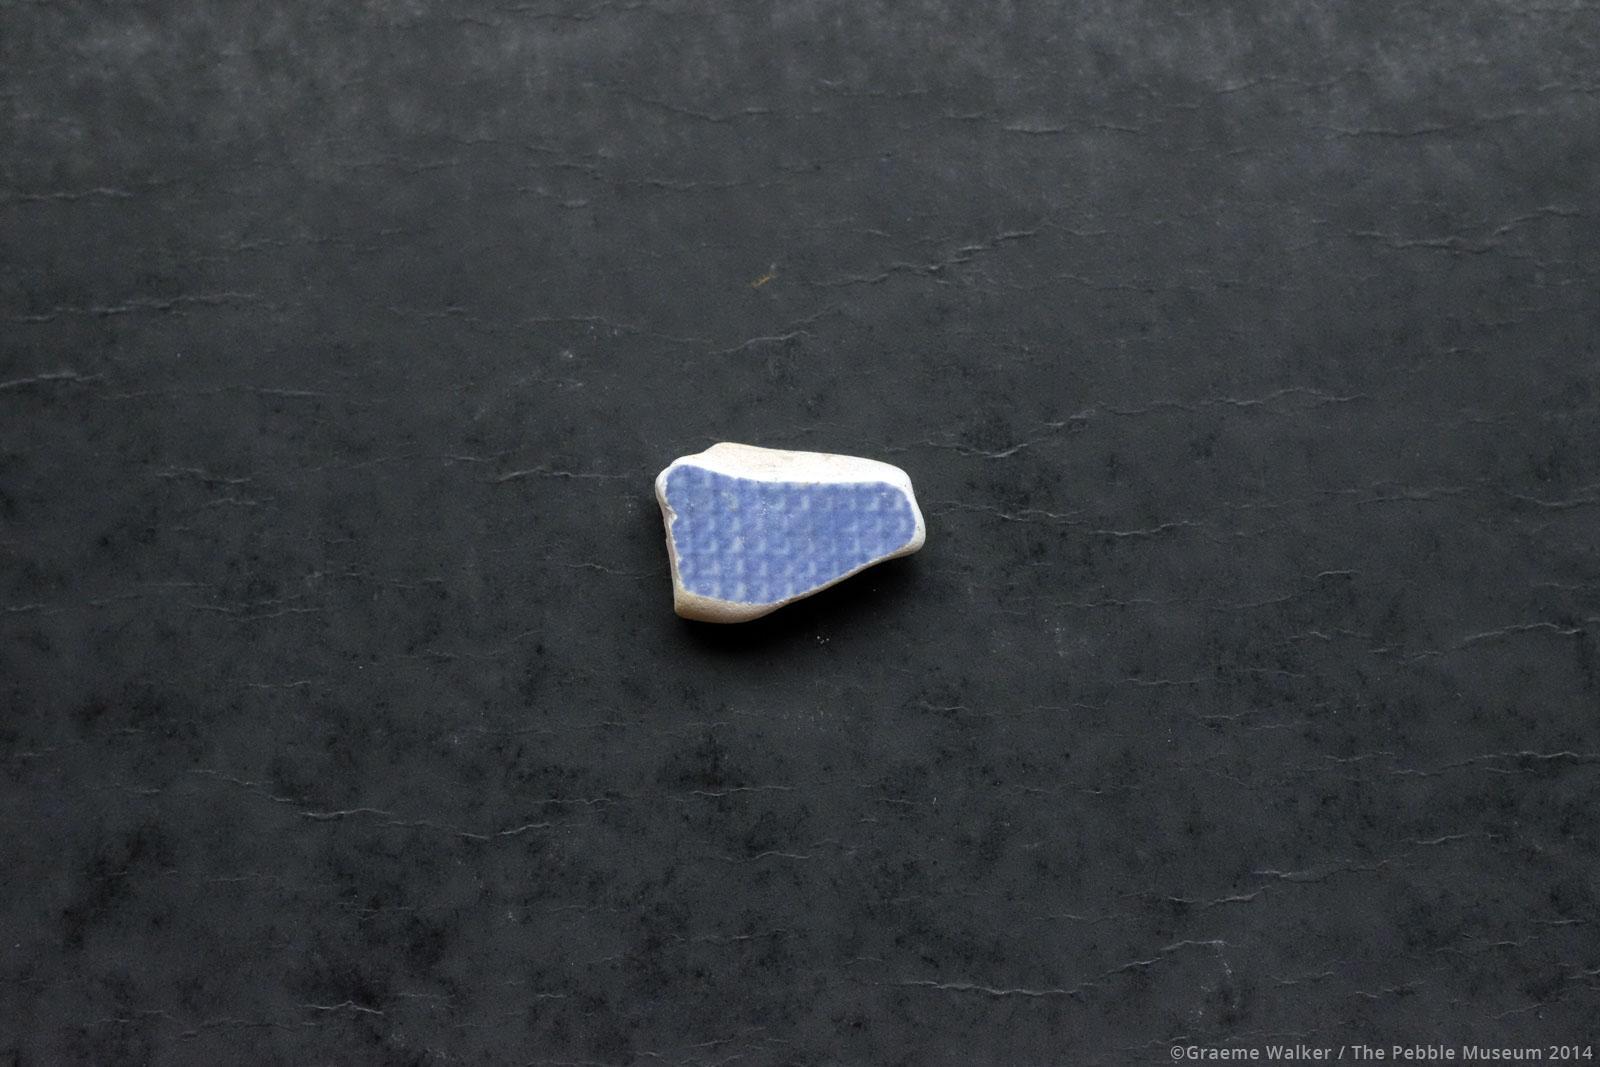 Blue Ceramic © Graeme Walker / The Pebble Museum 2019